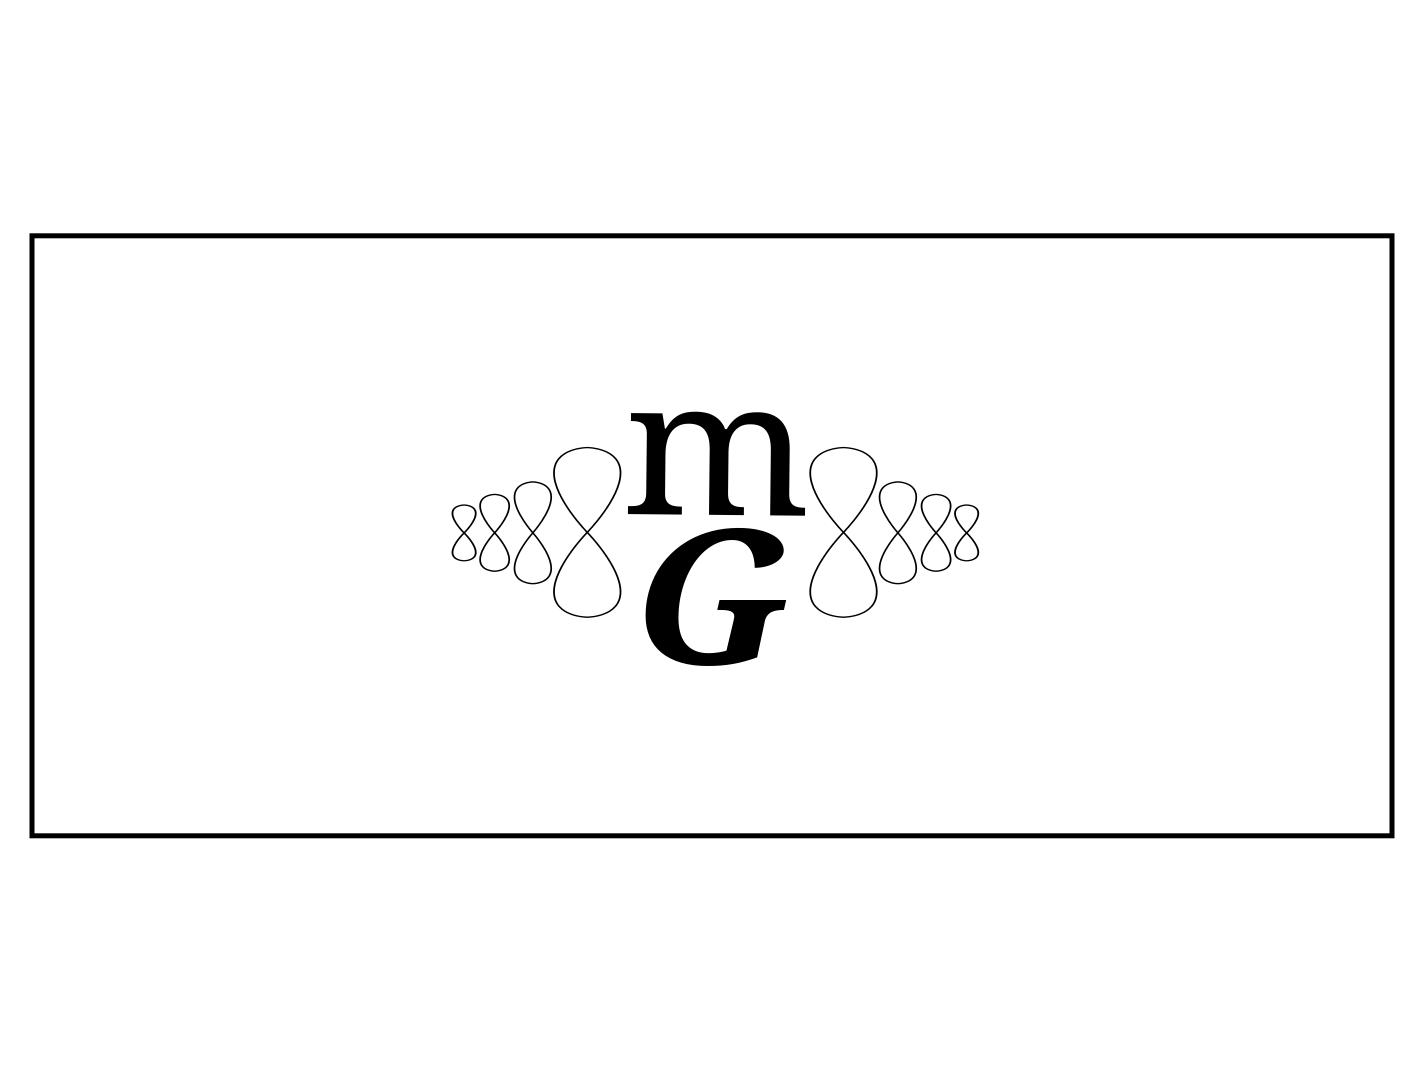 Custom Design by JaroslavProcka - Entry No. 191 in the Custom Design Contest Imaginative Custom Design for MG.